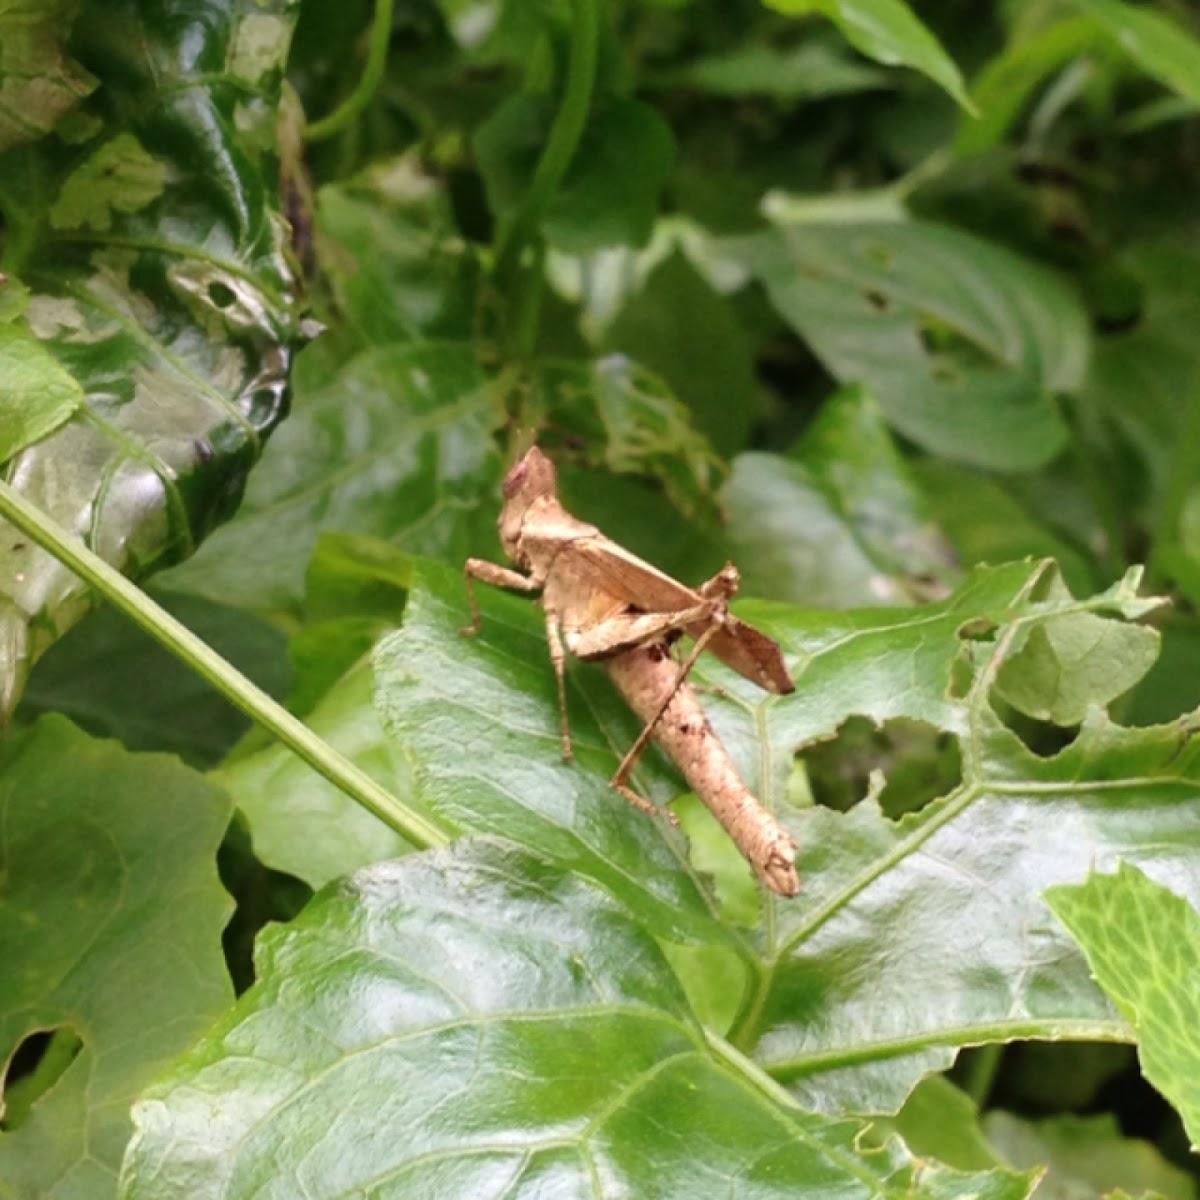 Dead Leaf Grasshopper